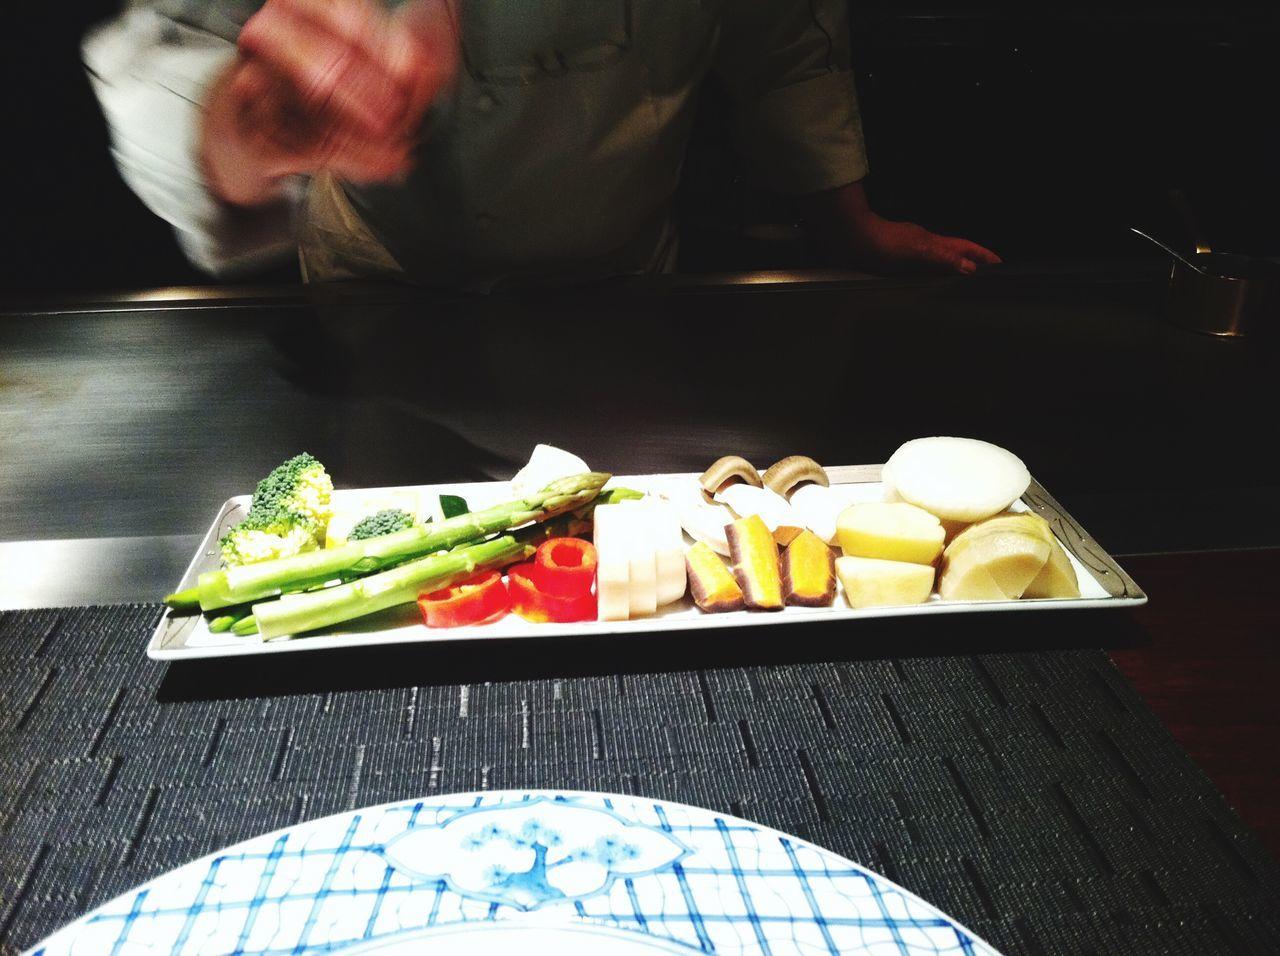 京都府 旅行 食事 Japan Kyouto Traveling Dinner